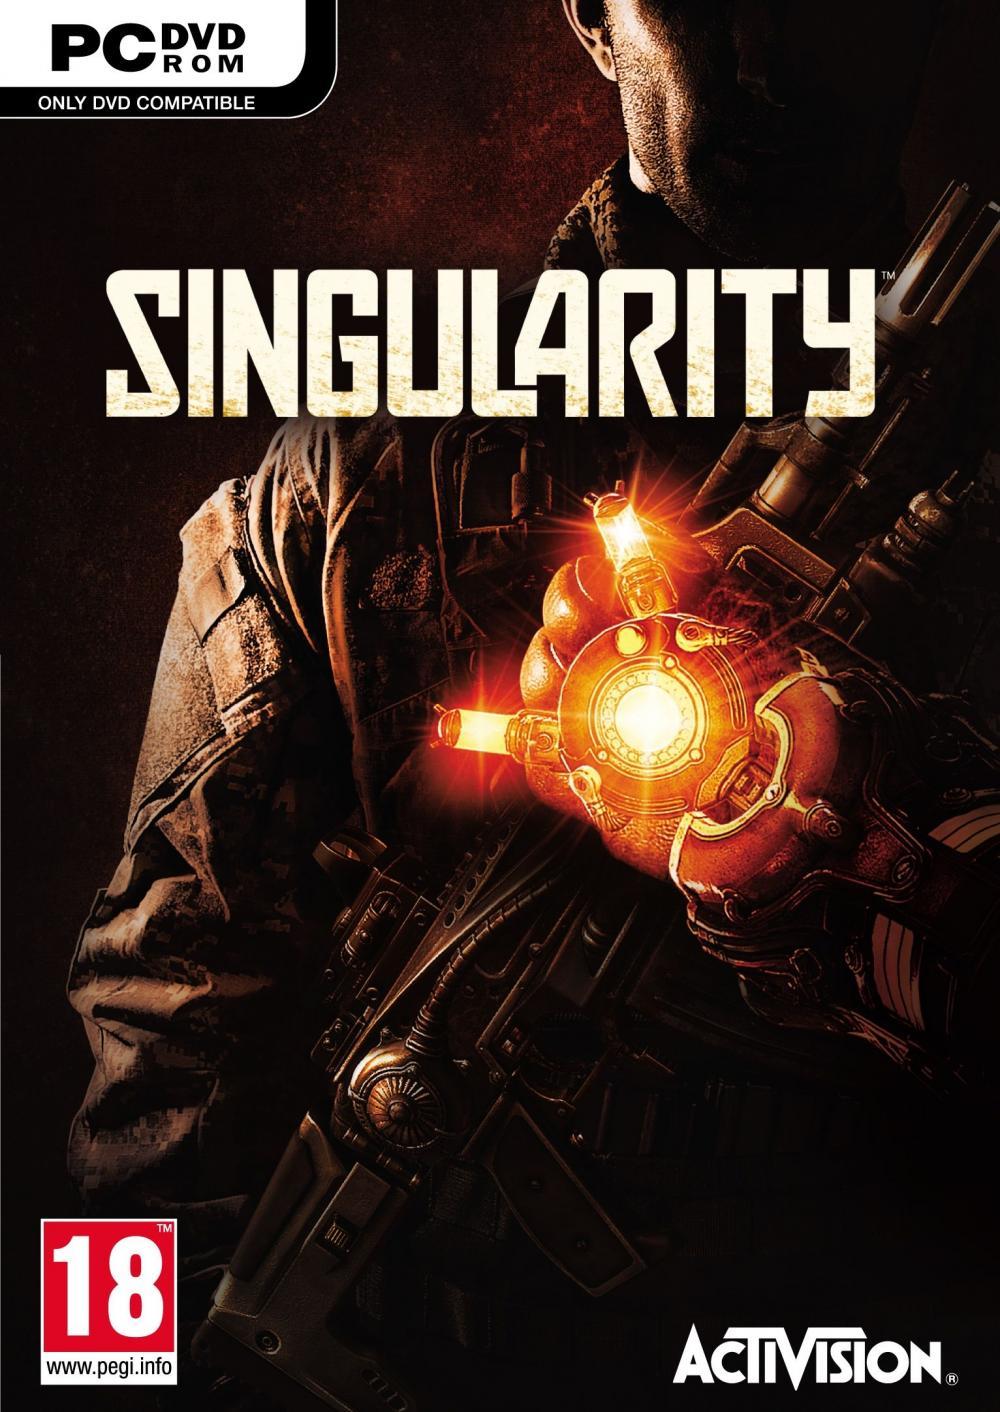 SINGULARITY PC